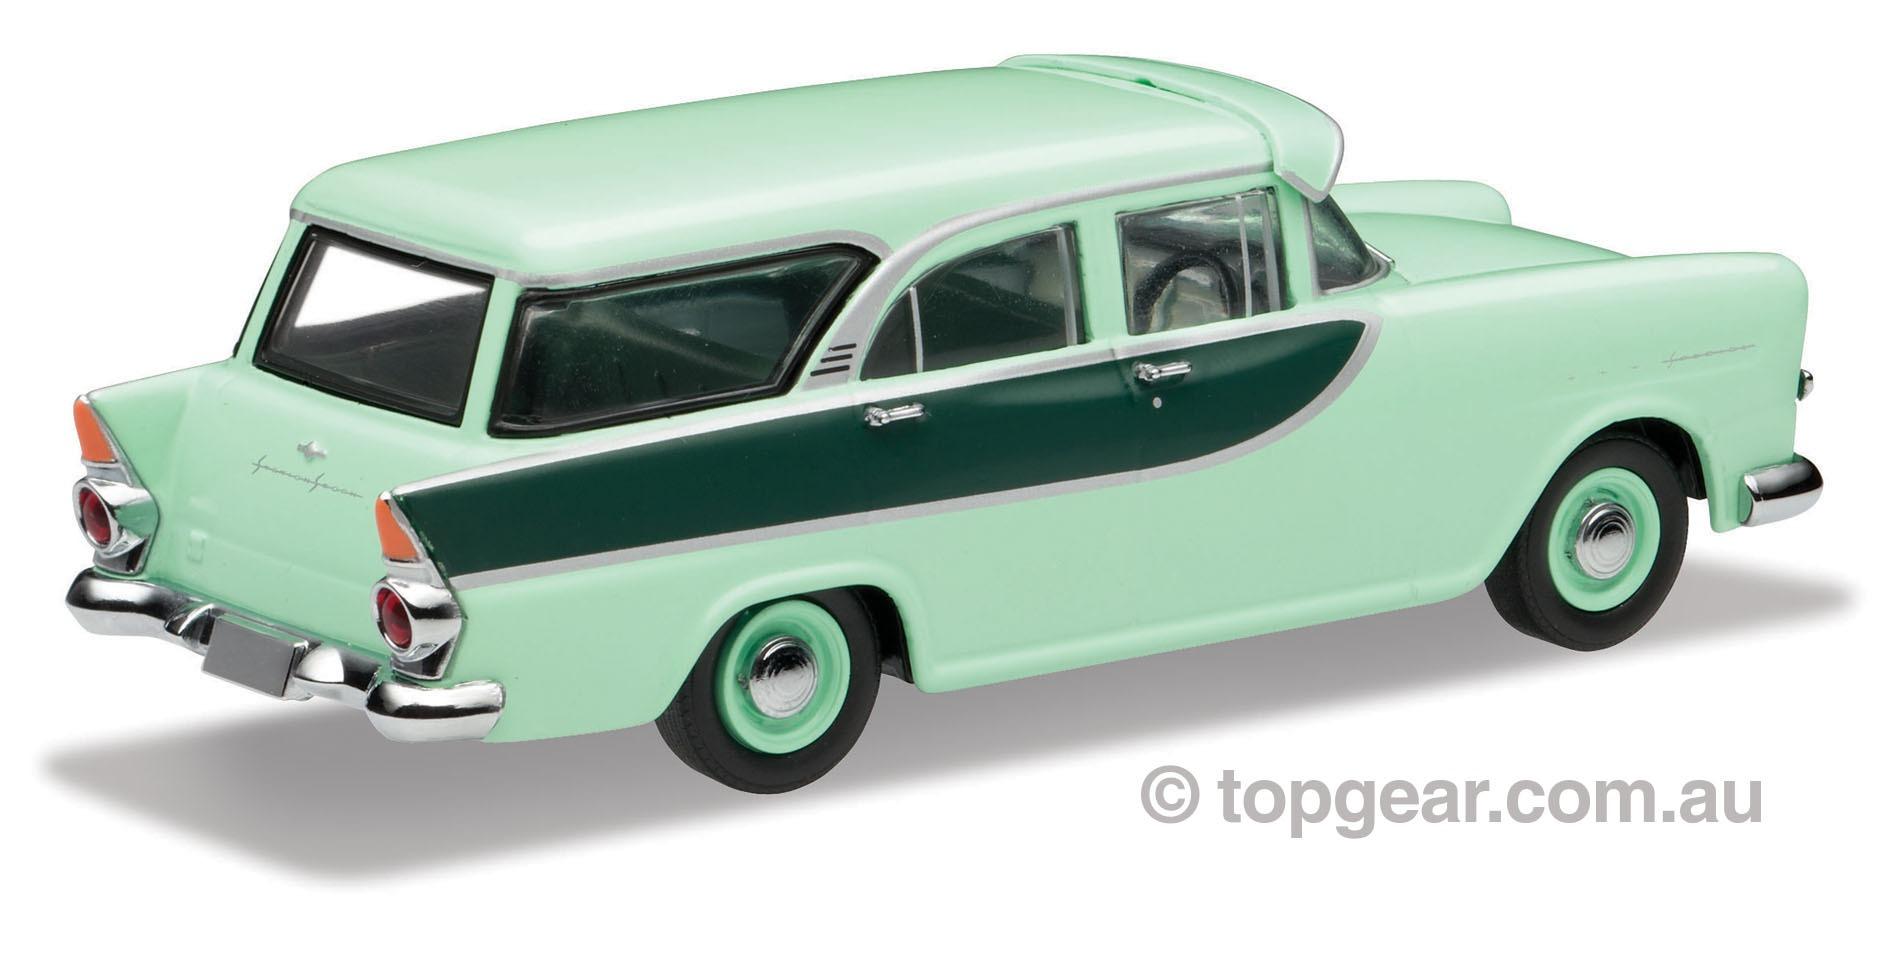 1960 FB Special Station Sedan – Glade Green/Woodsman Green